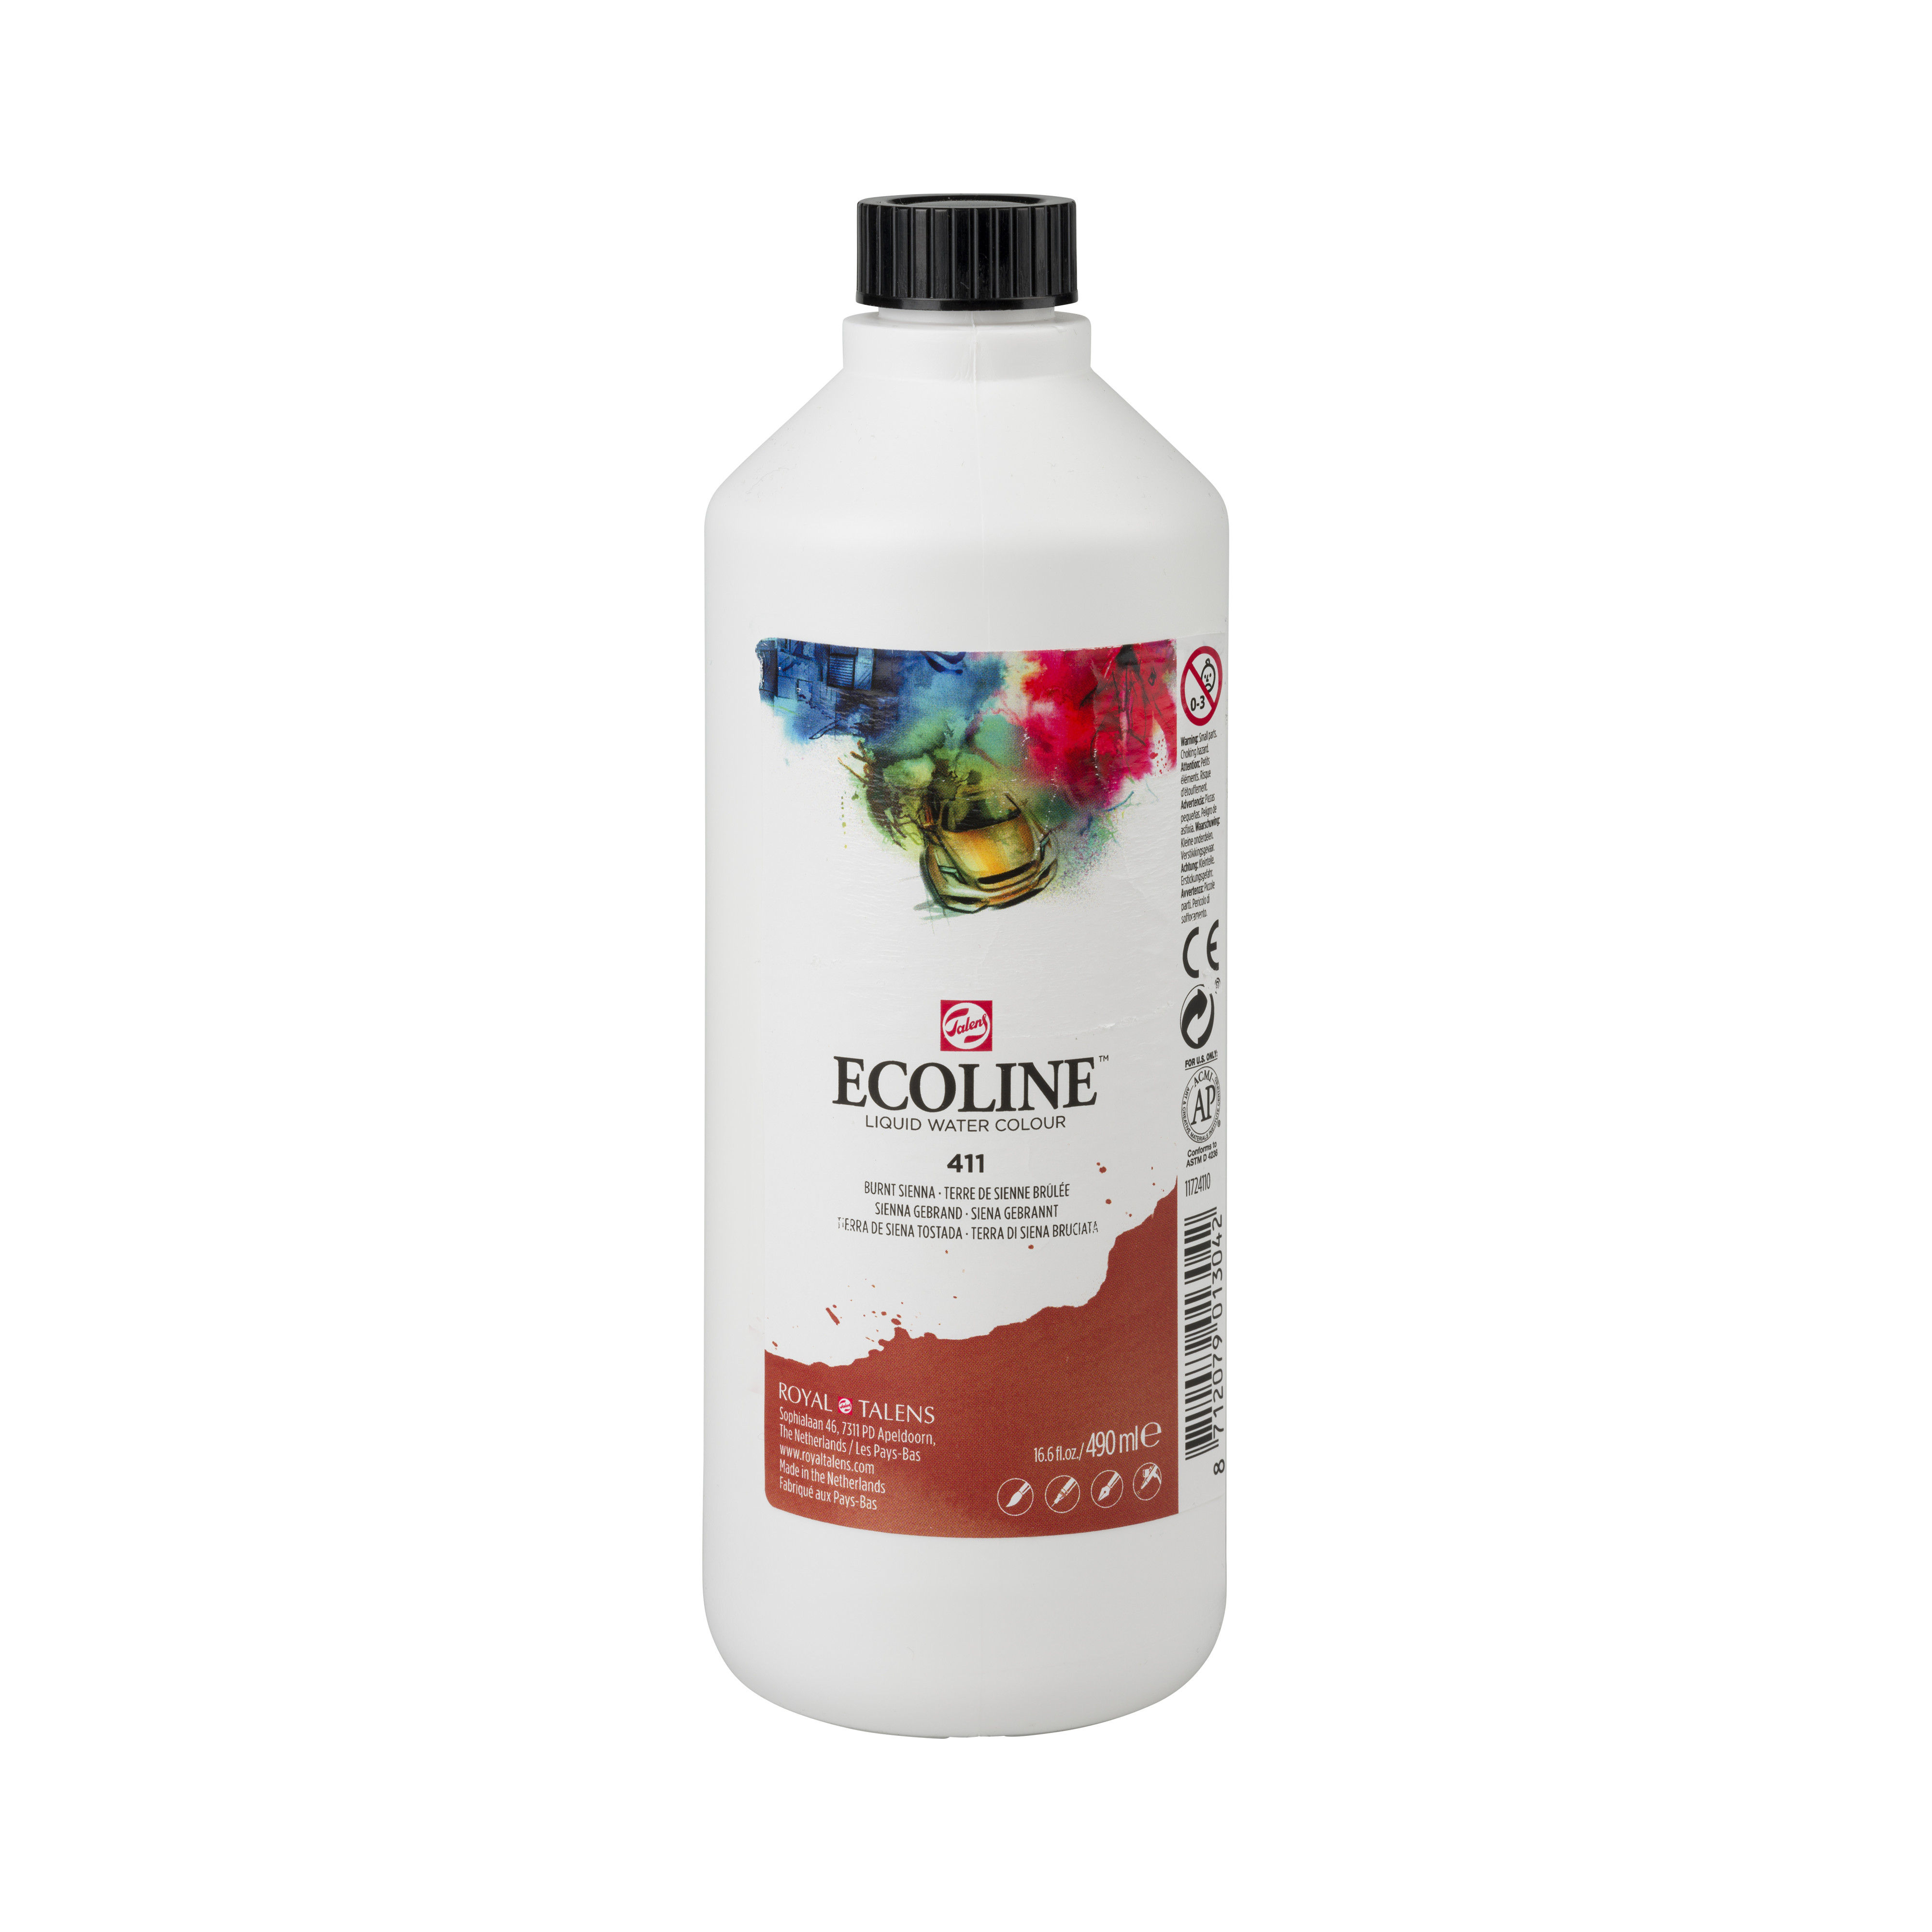 Ecoline Liquid Watercolour Plastic Bottle 490 ml Burnt Sienna 411